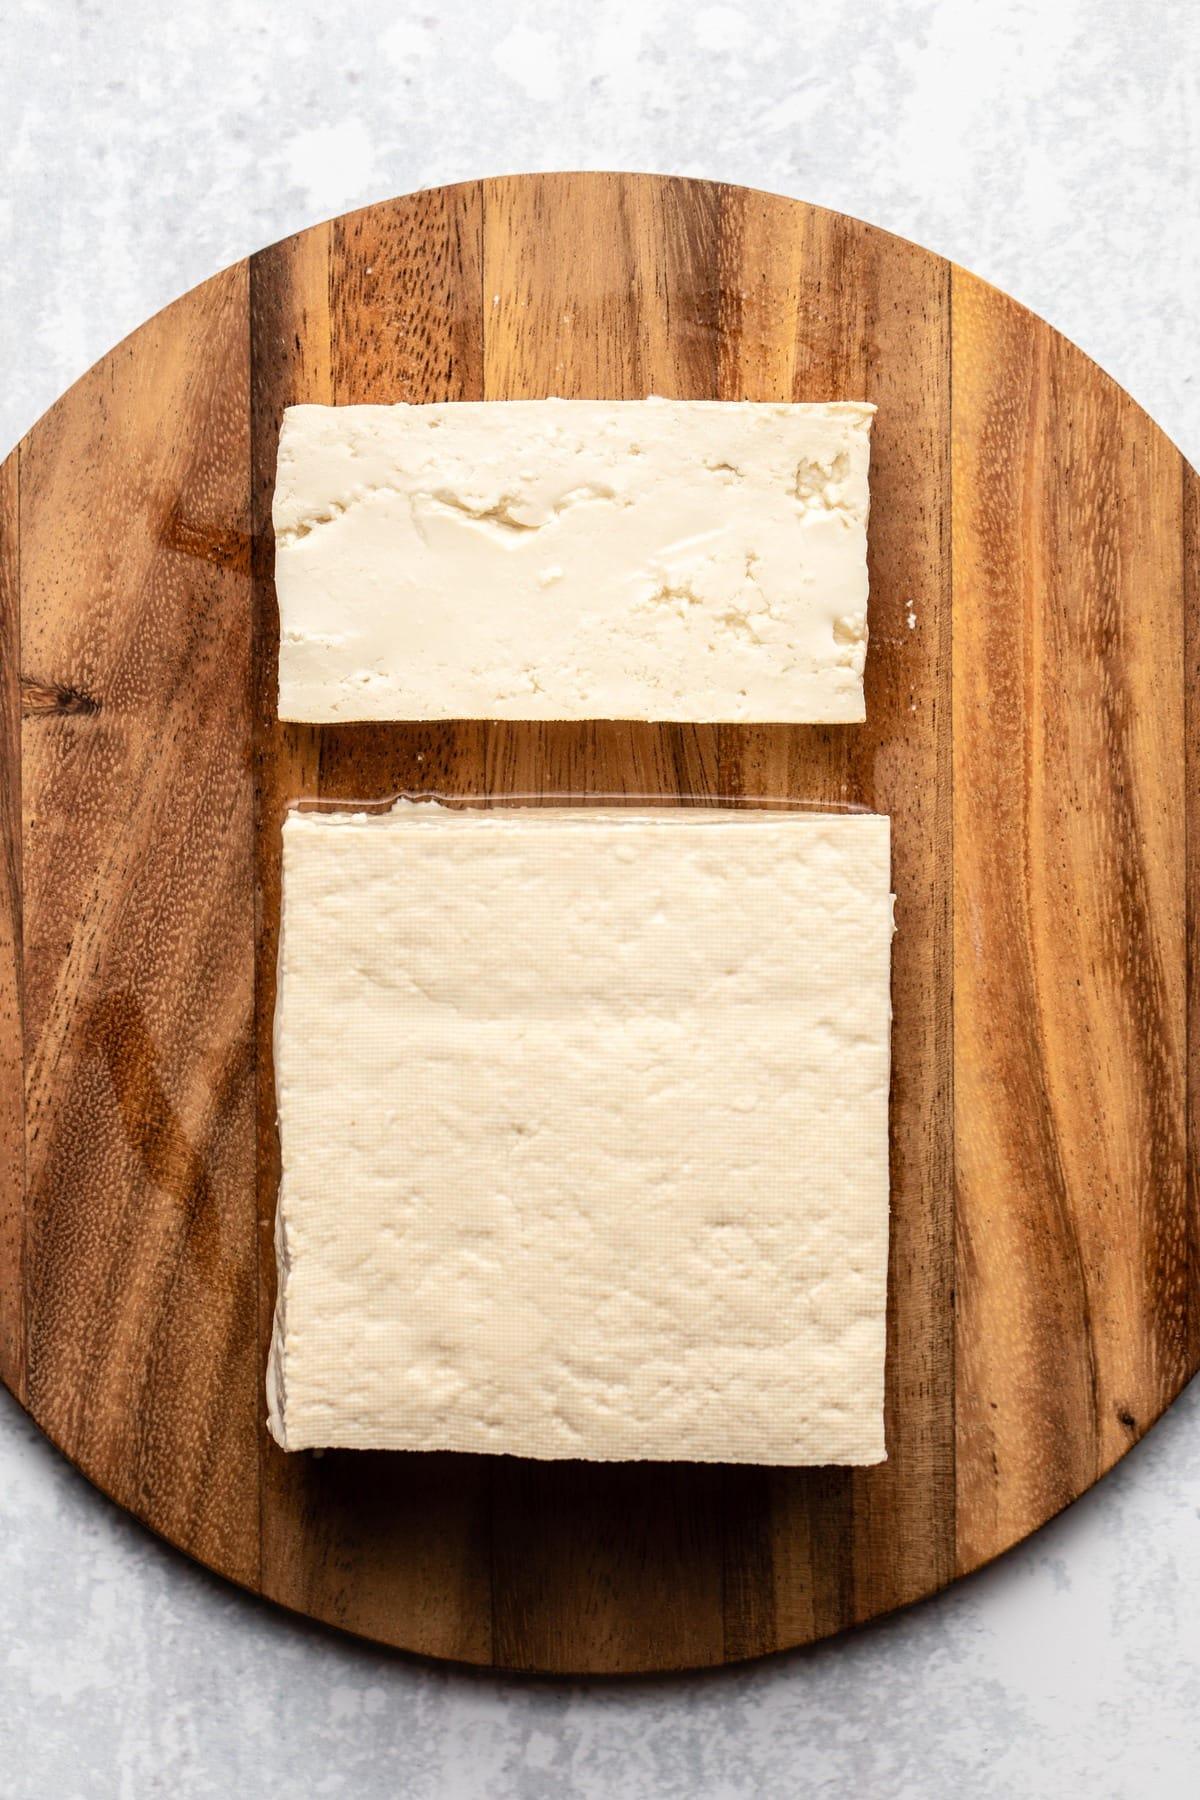 block of firm tofu on round wood cutting board